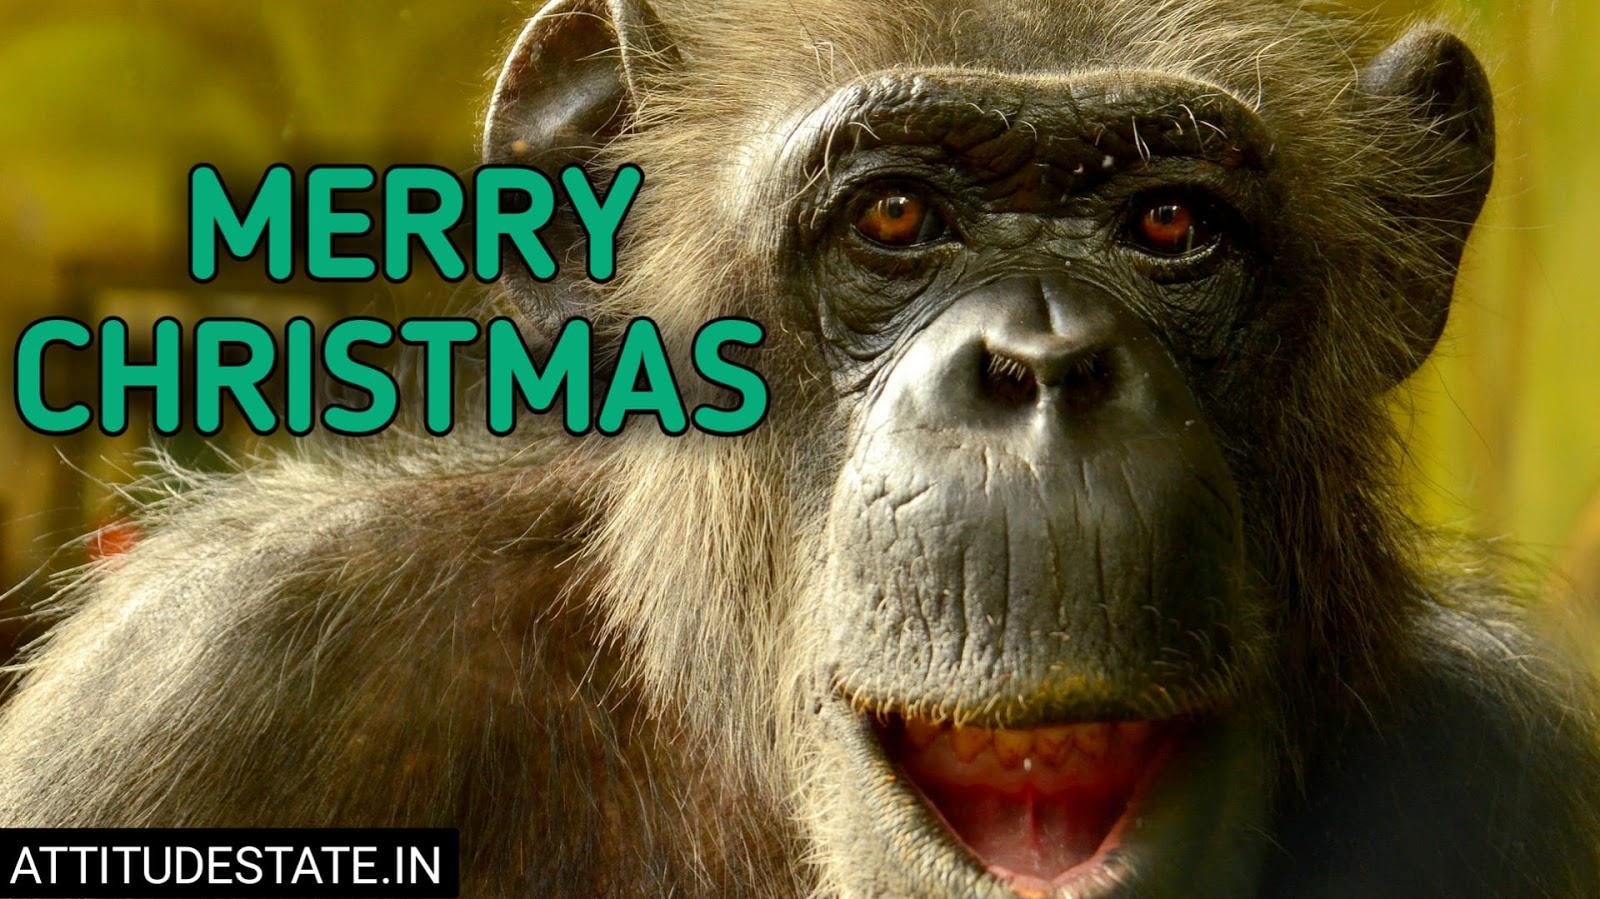 funny merry christmas greetings